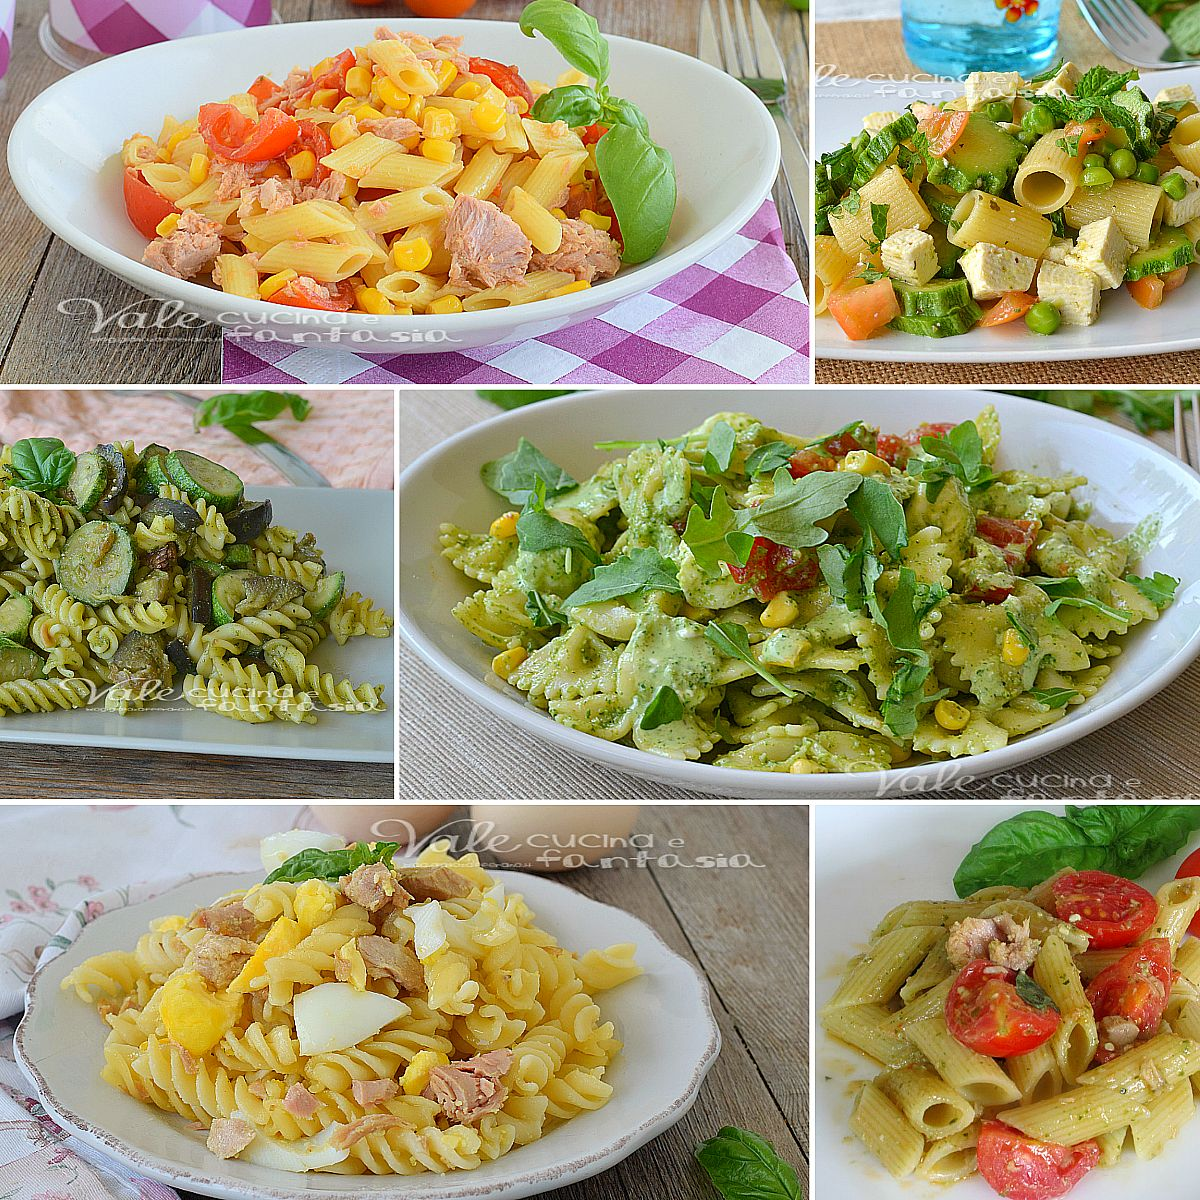 Pasta fredda ricette facili e veloci ricette pasta for Ricette facili veloci